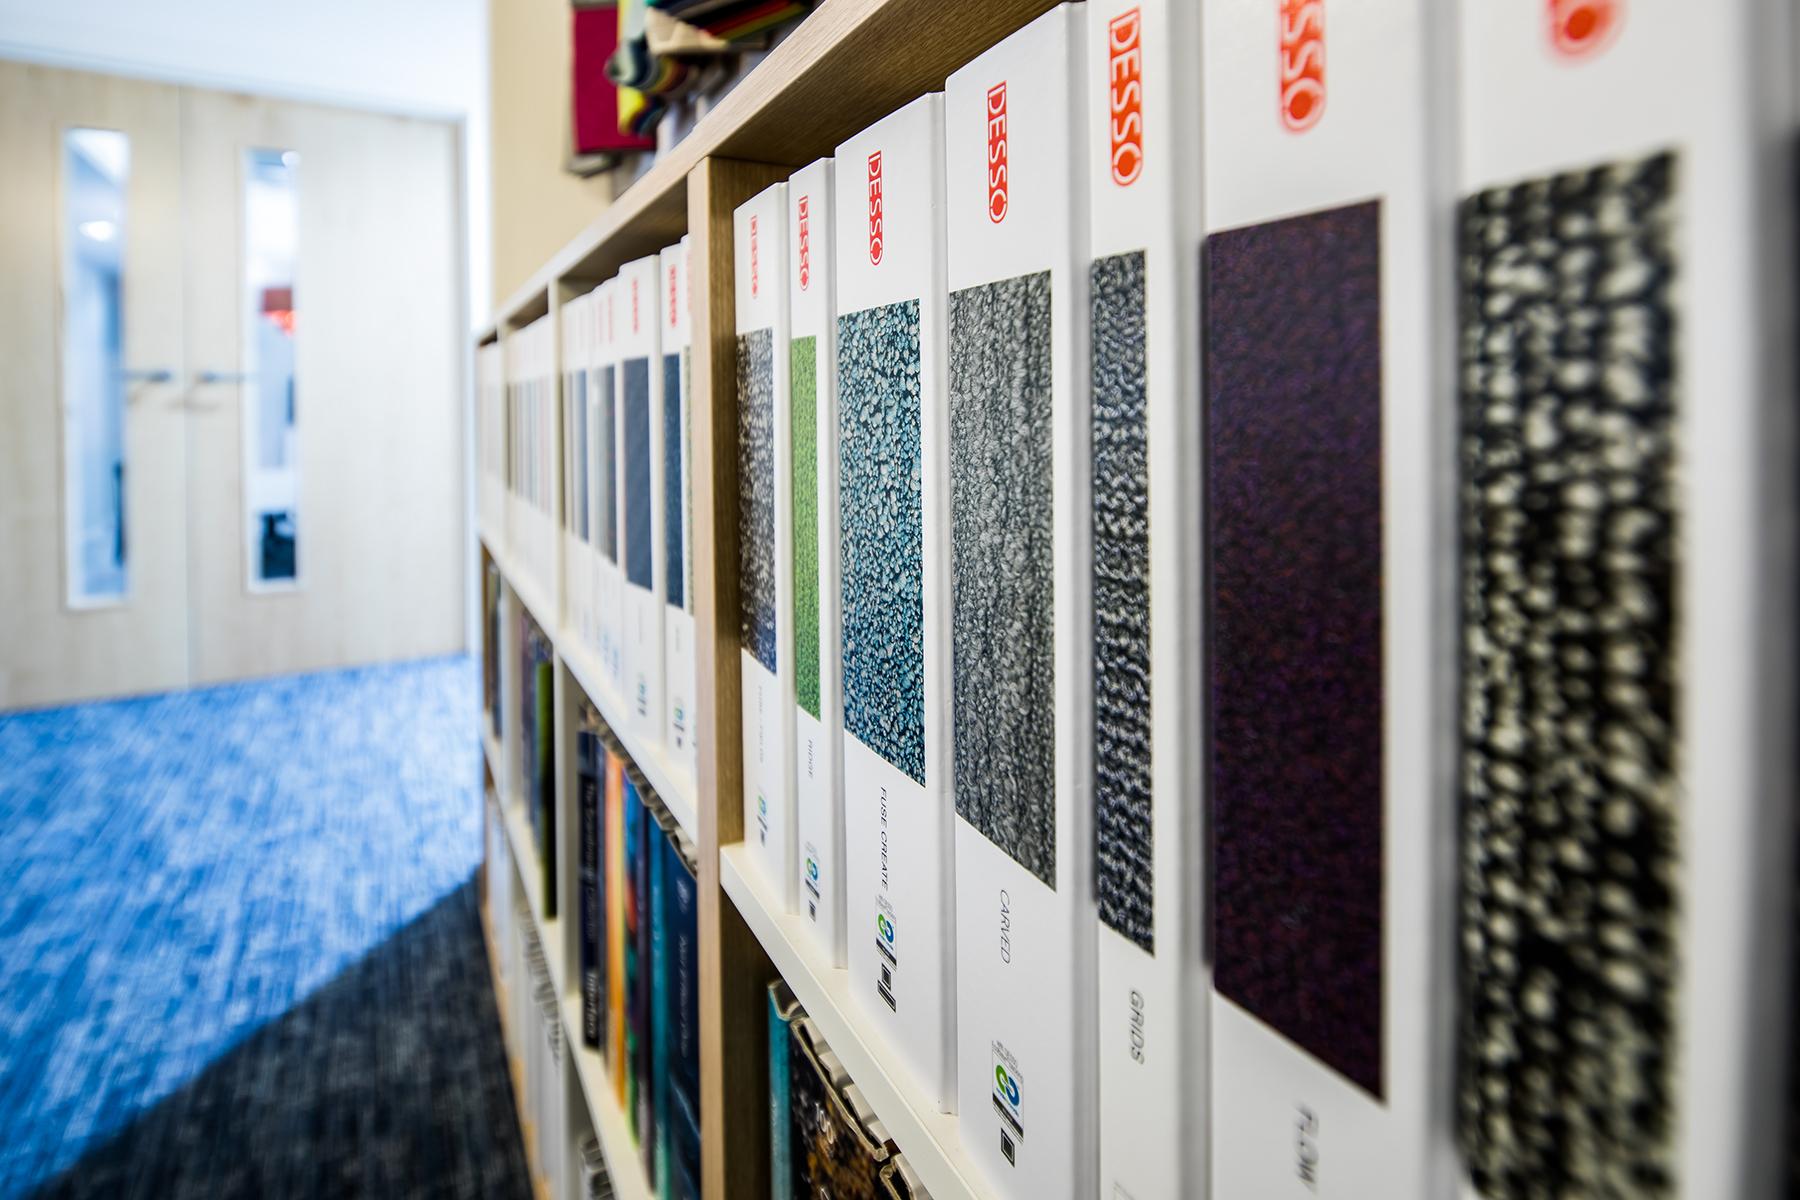 carpet, desso, interior design, commercial build, office interior, sheffield offices, uk offices, commercial interior design